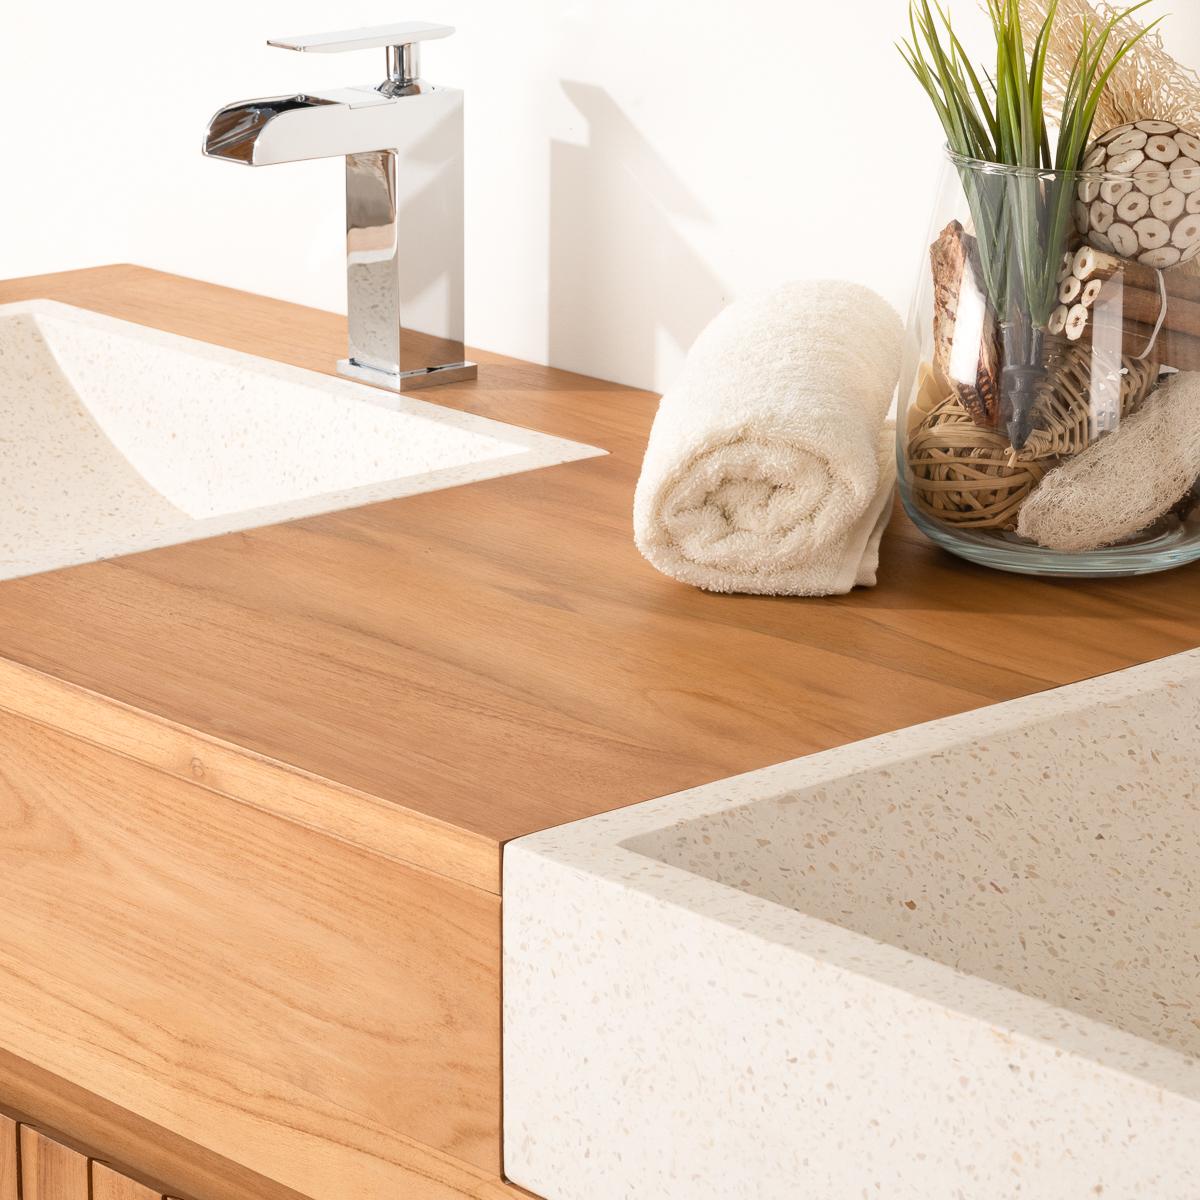 Accessoire Salle De Bain Terrazzo ~ meuble sous vasque double vasque en bois teck massif 2 vasque